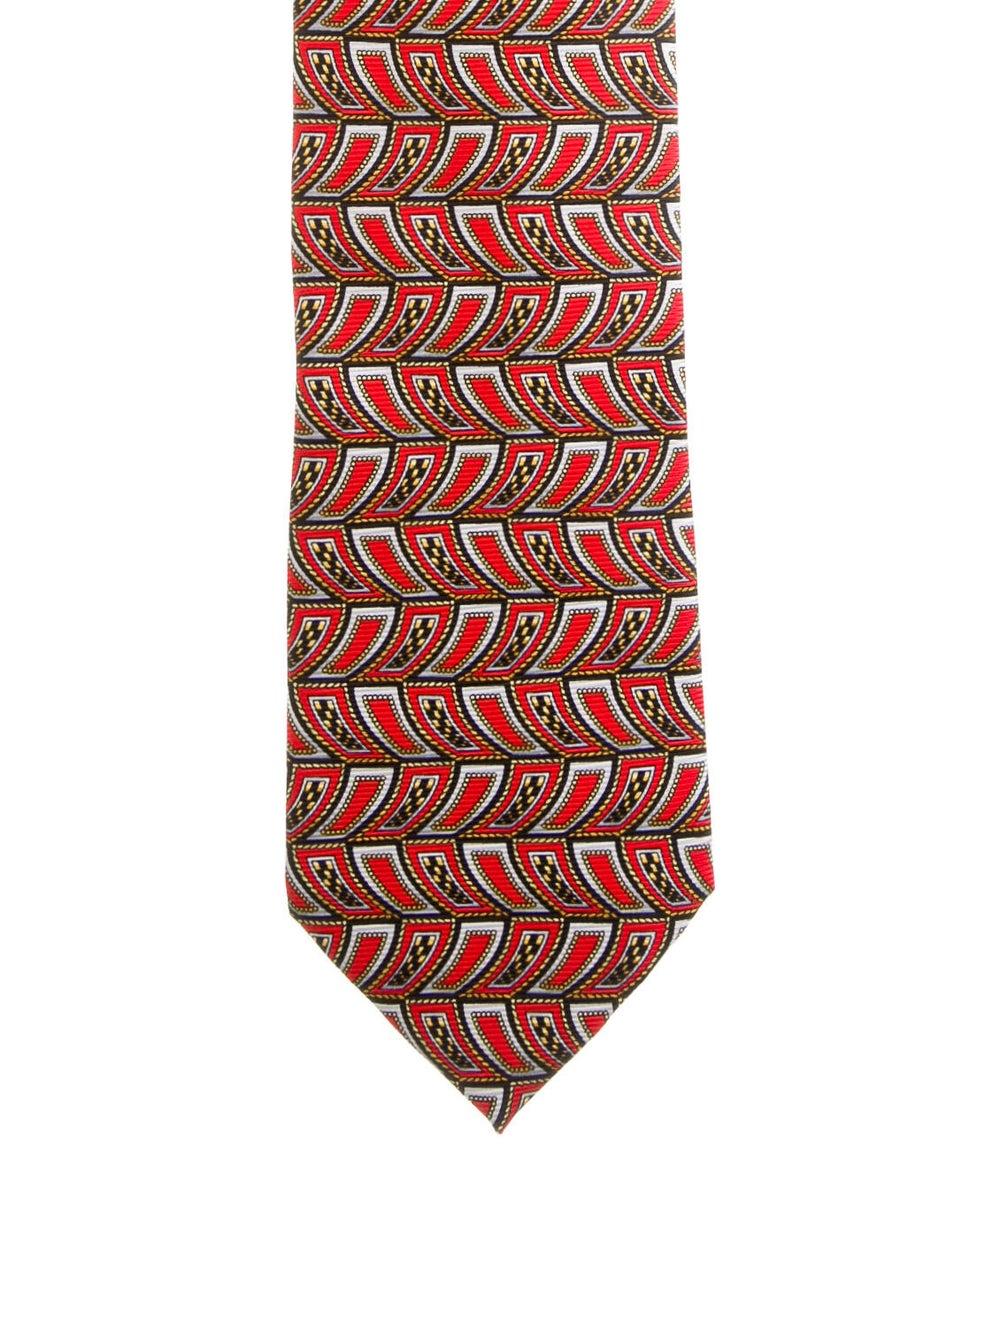 Gianni Versace Silk Printed Tie red - image 1